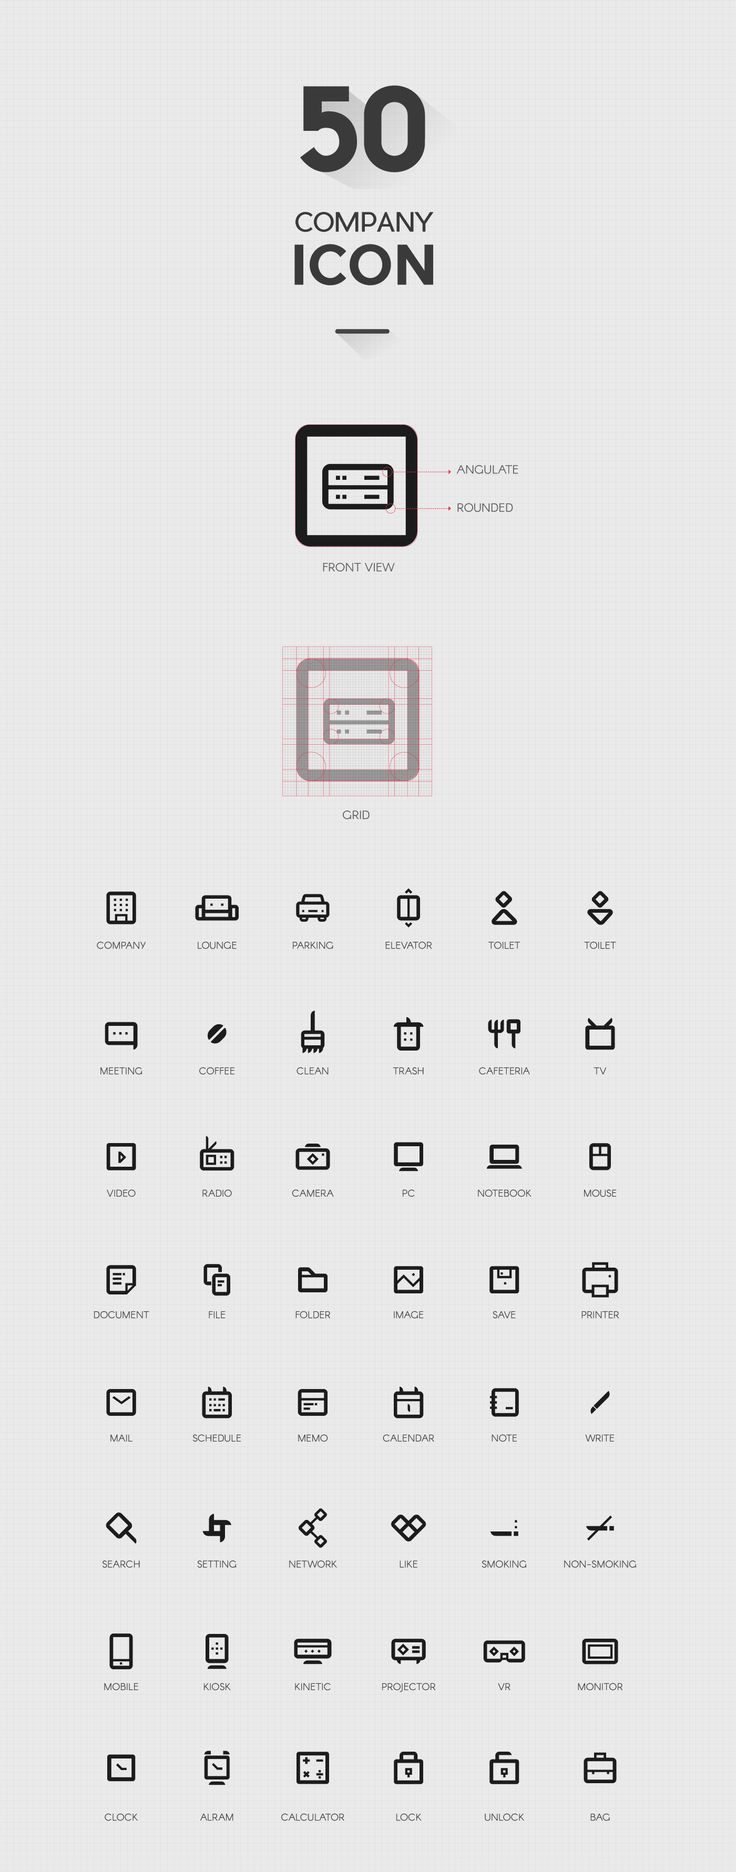 Company icon set on Behance